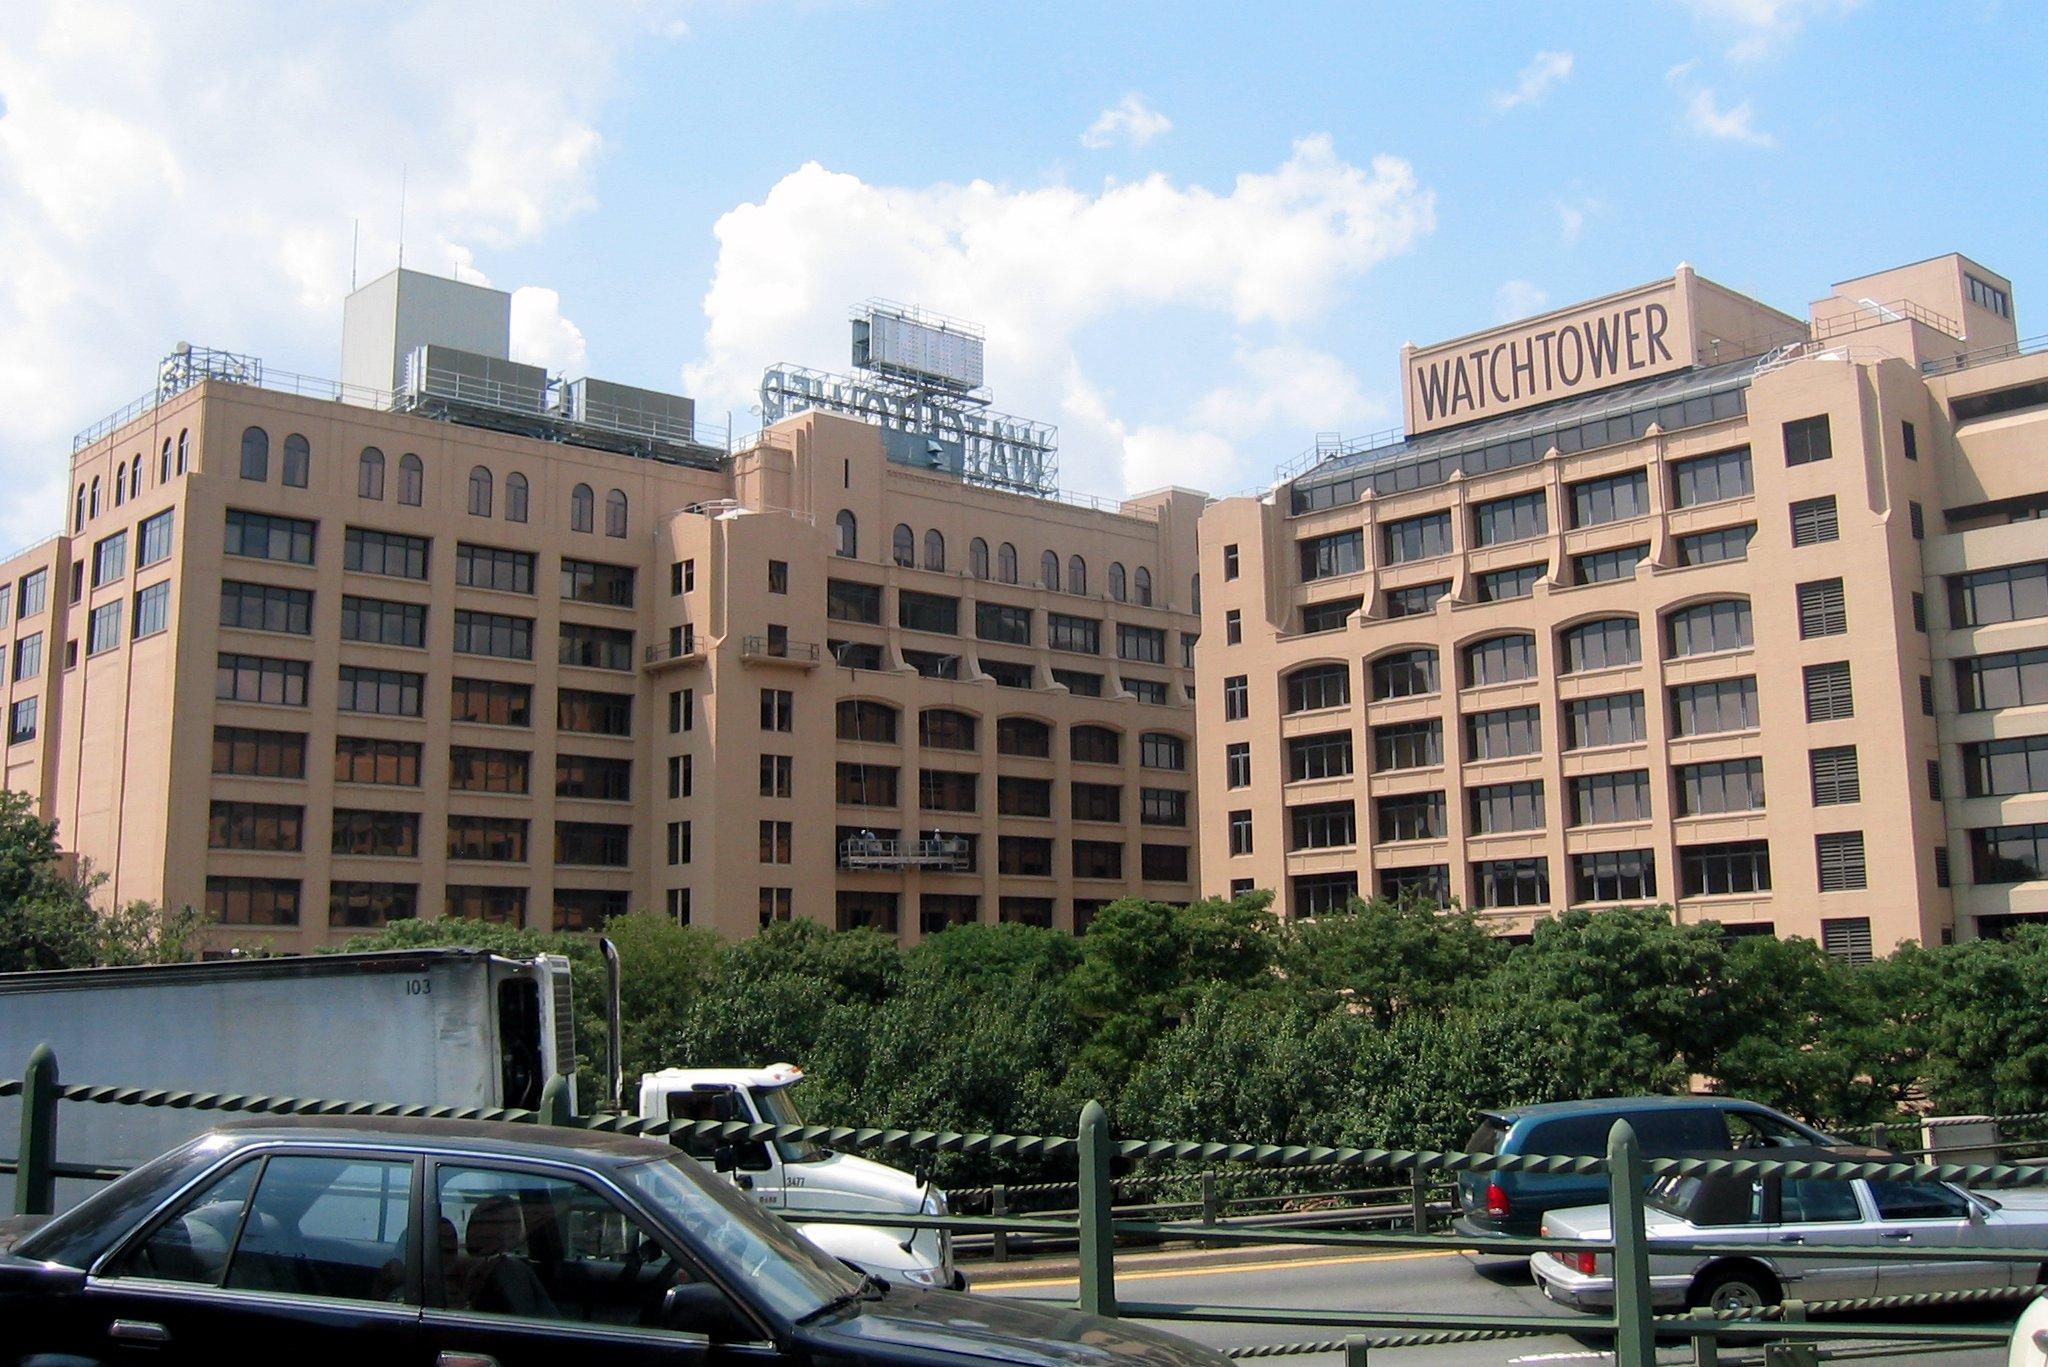 Brooklyn Brooklyn Heights Watchtower Building The